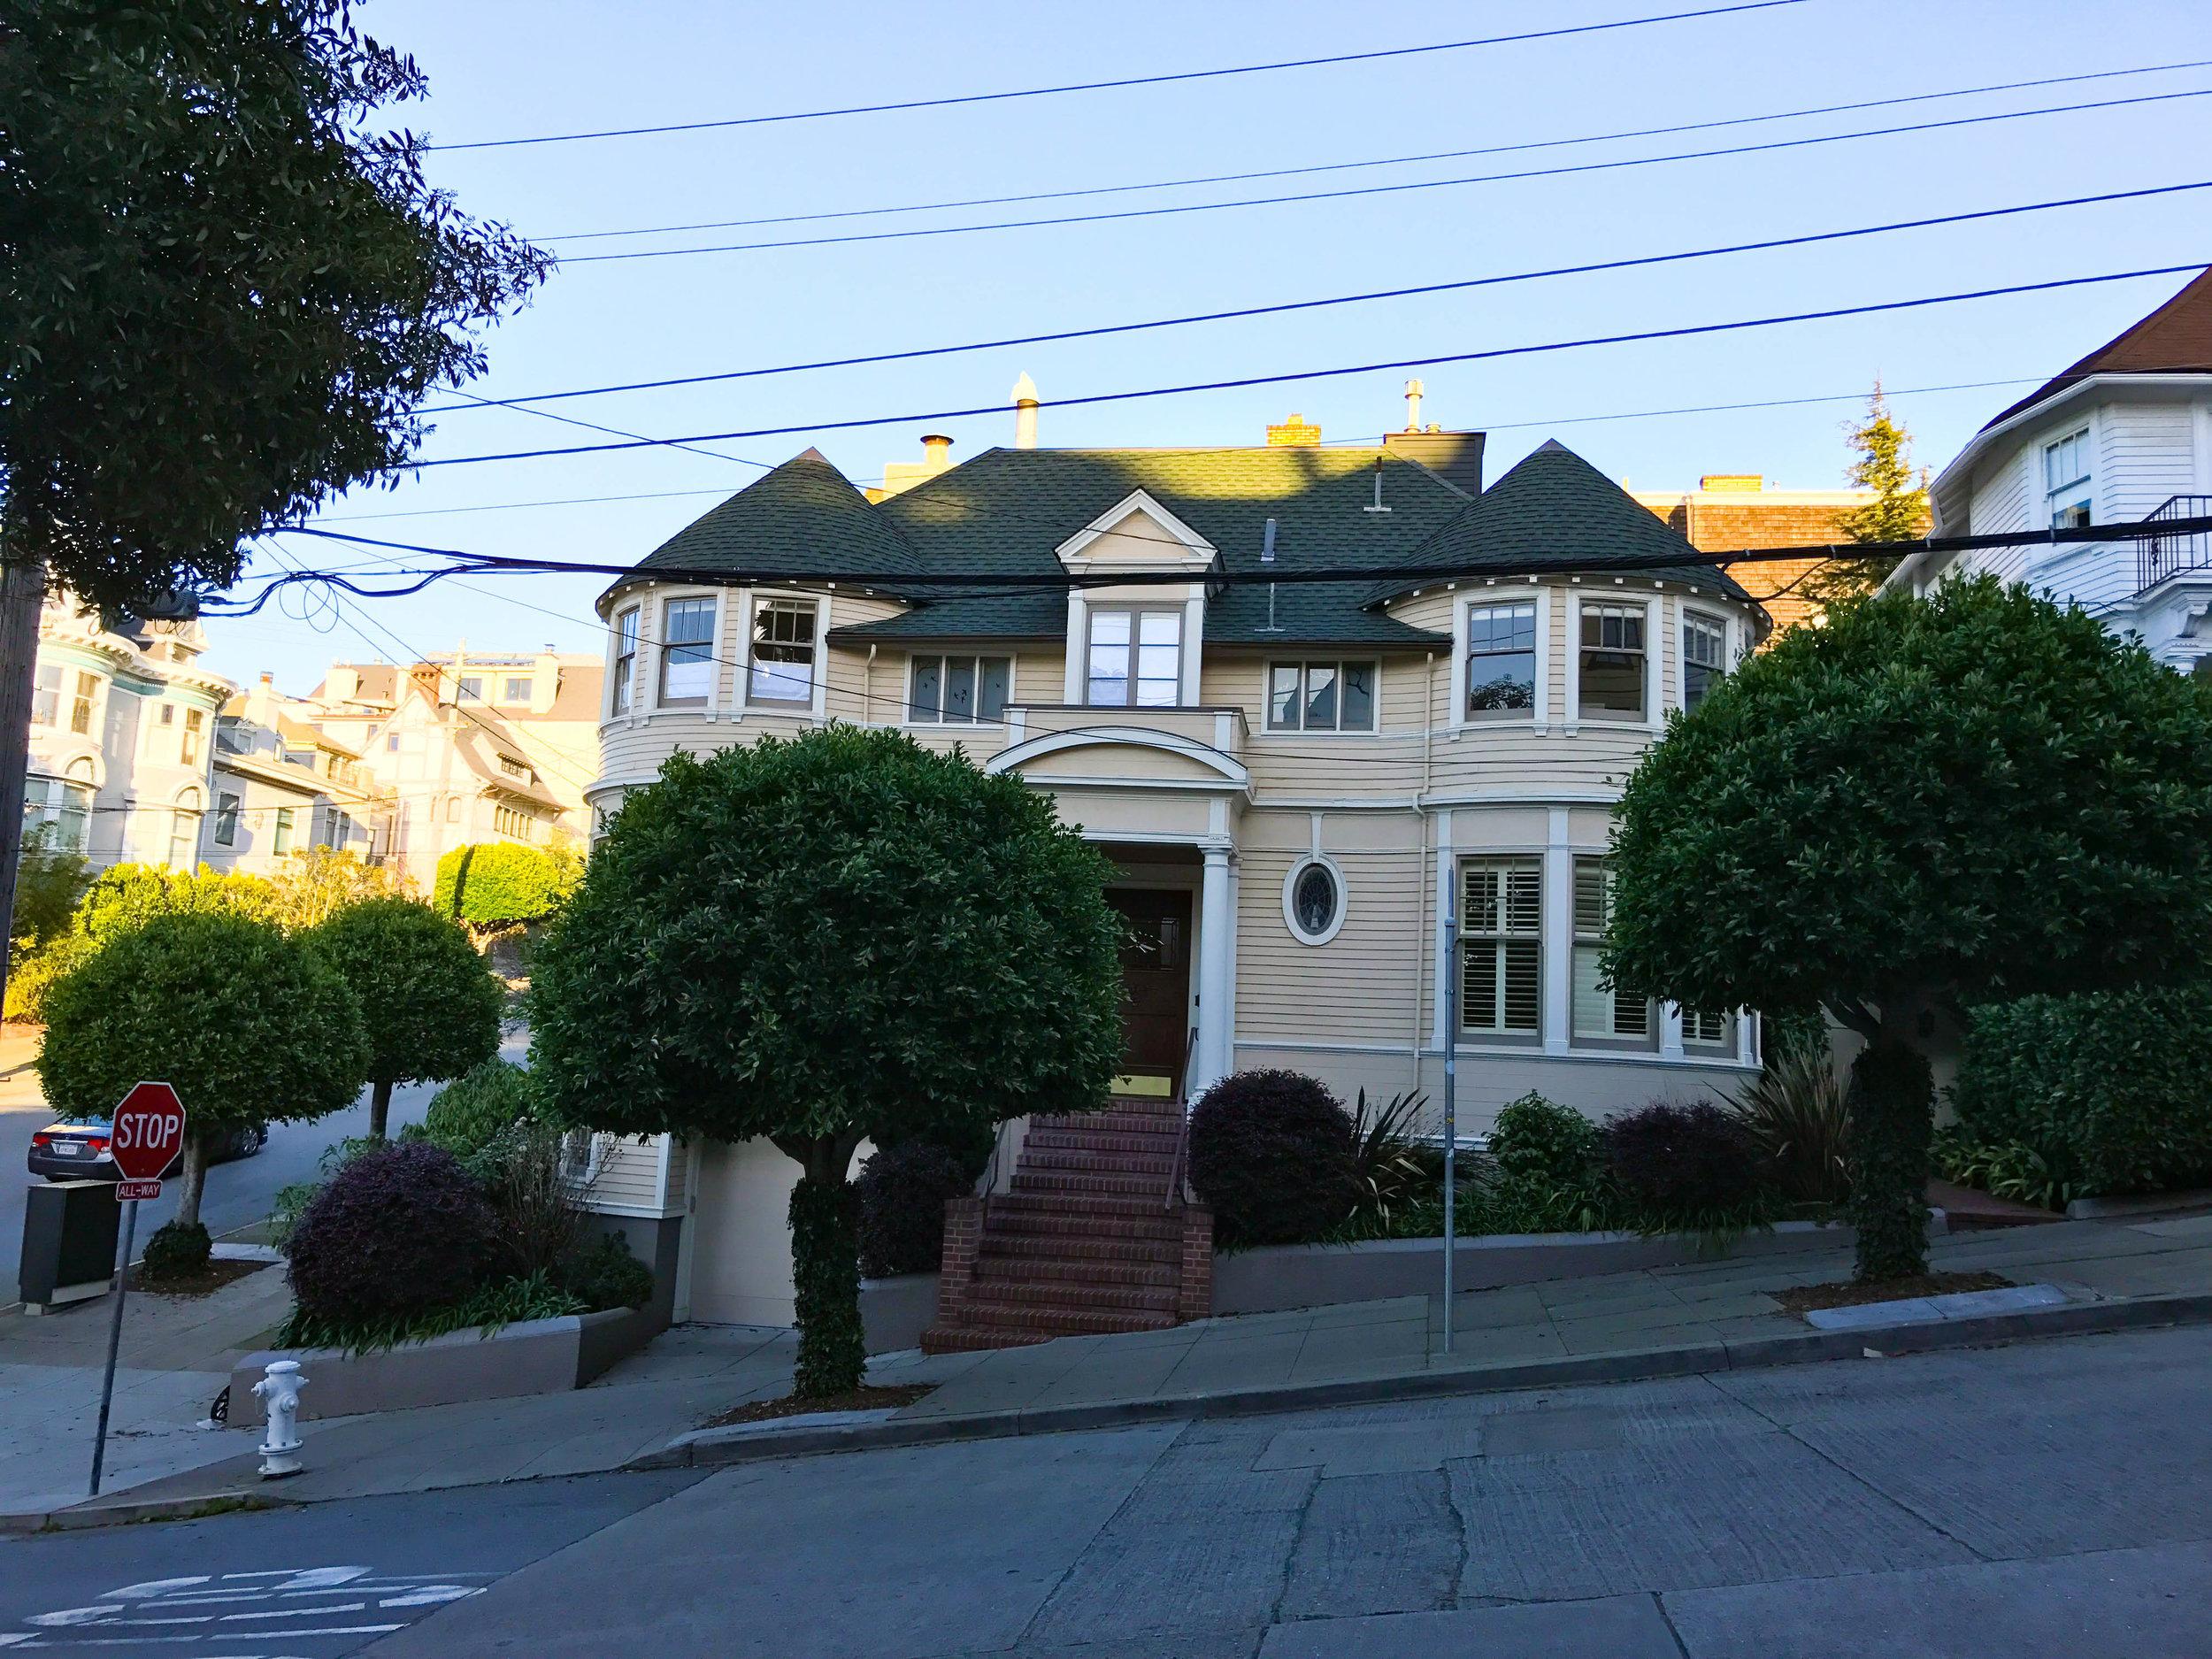 San_Francisco-Mrs_Doubtfire_House_Steiner.jpg